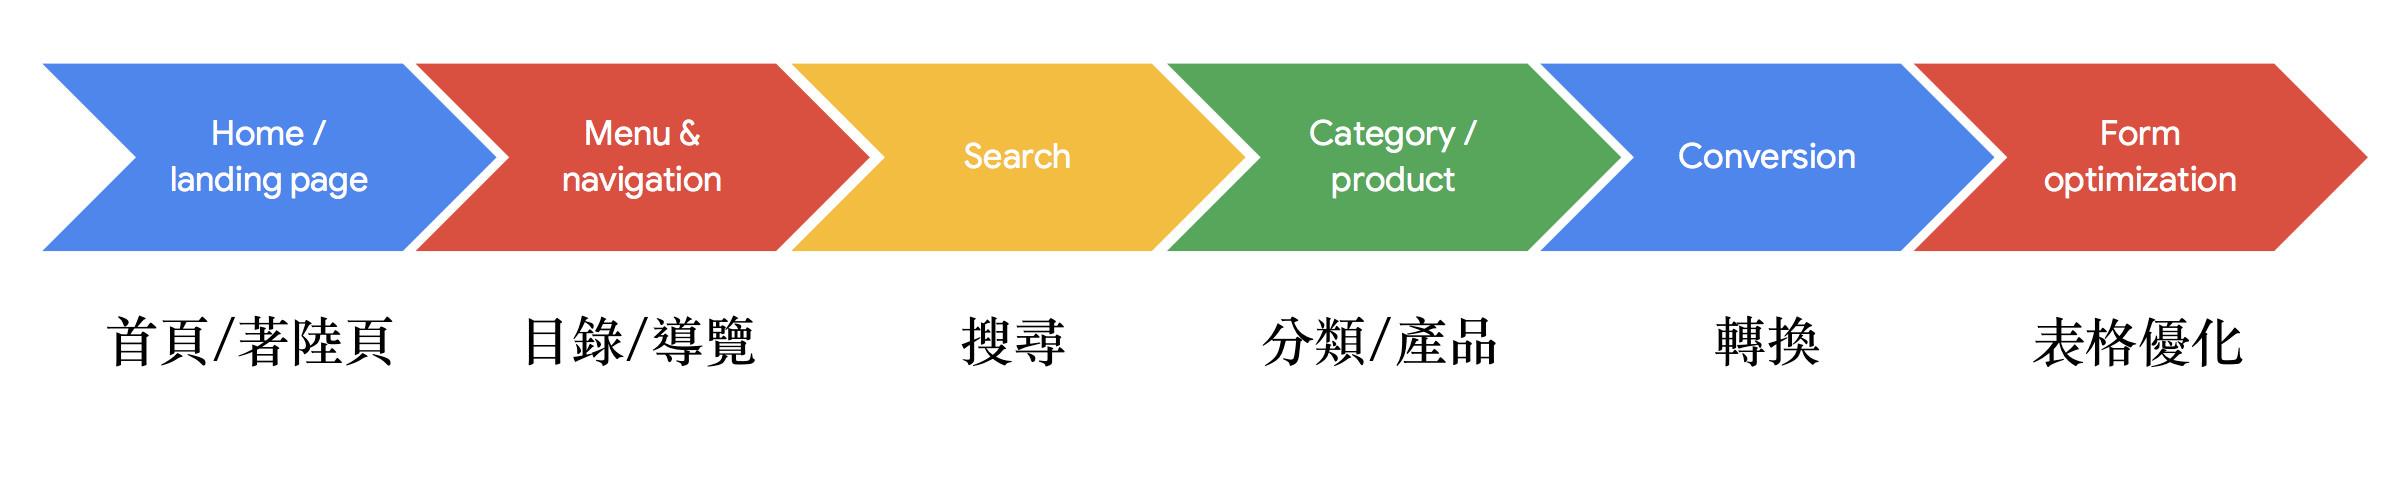 Google UX playbook for retail 六大主題-鯊客科技網站SEO優化公司